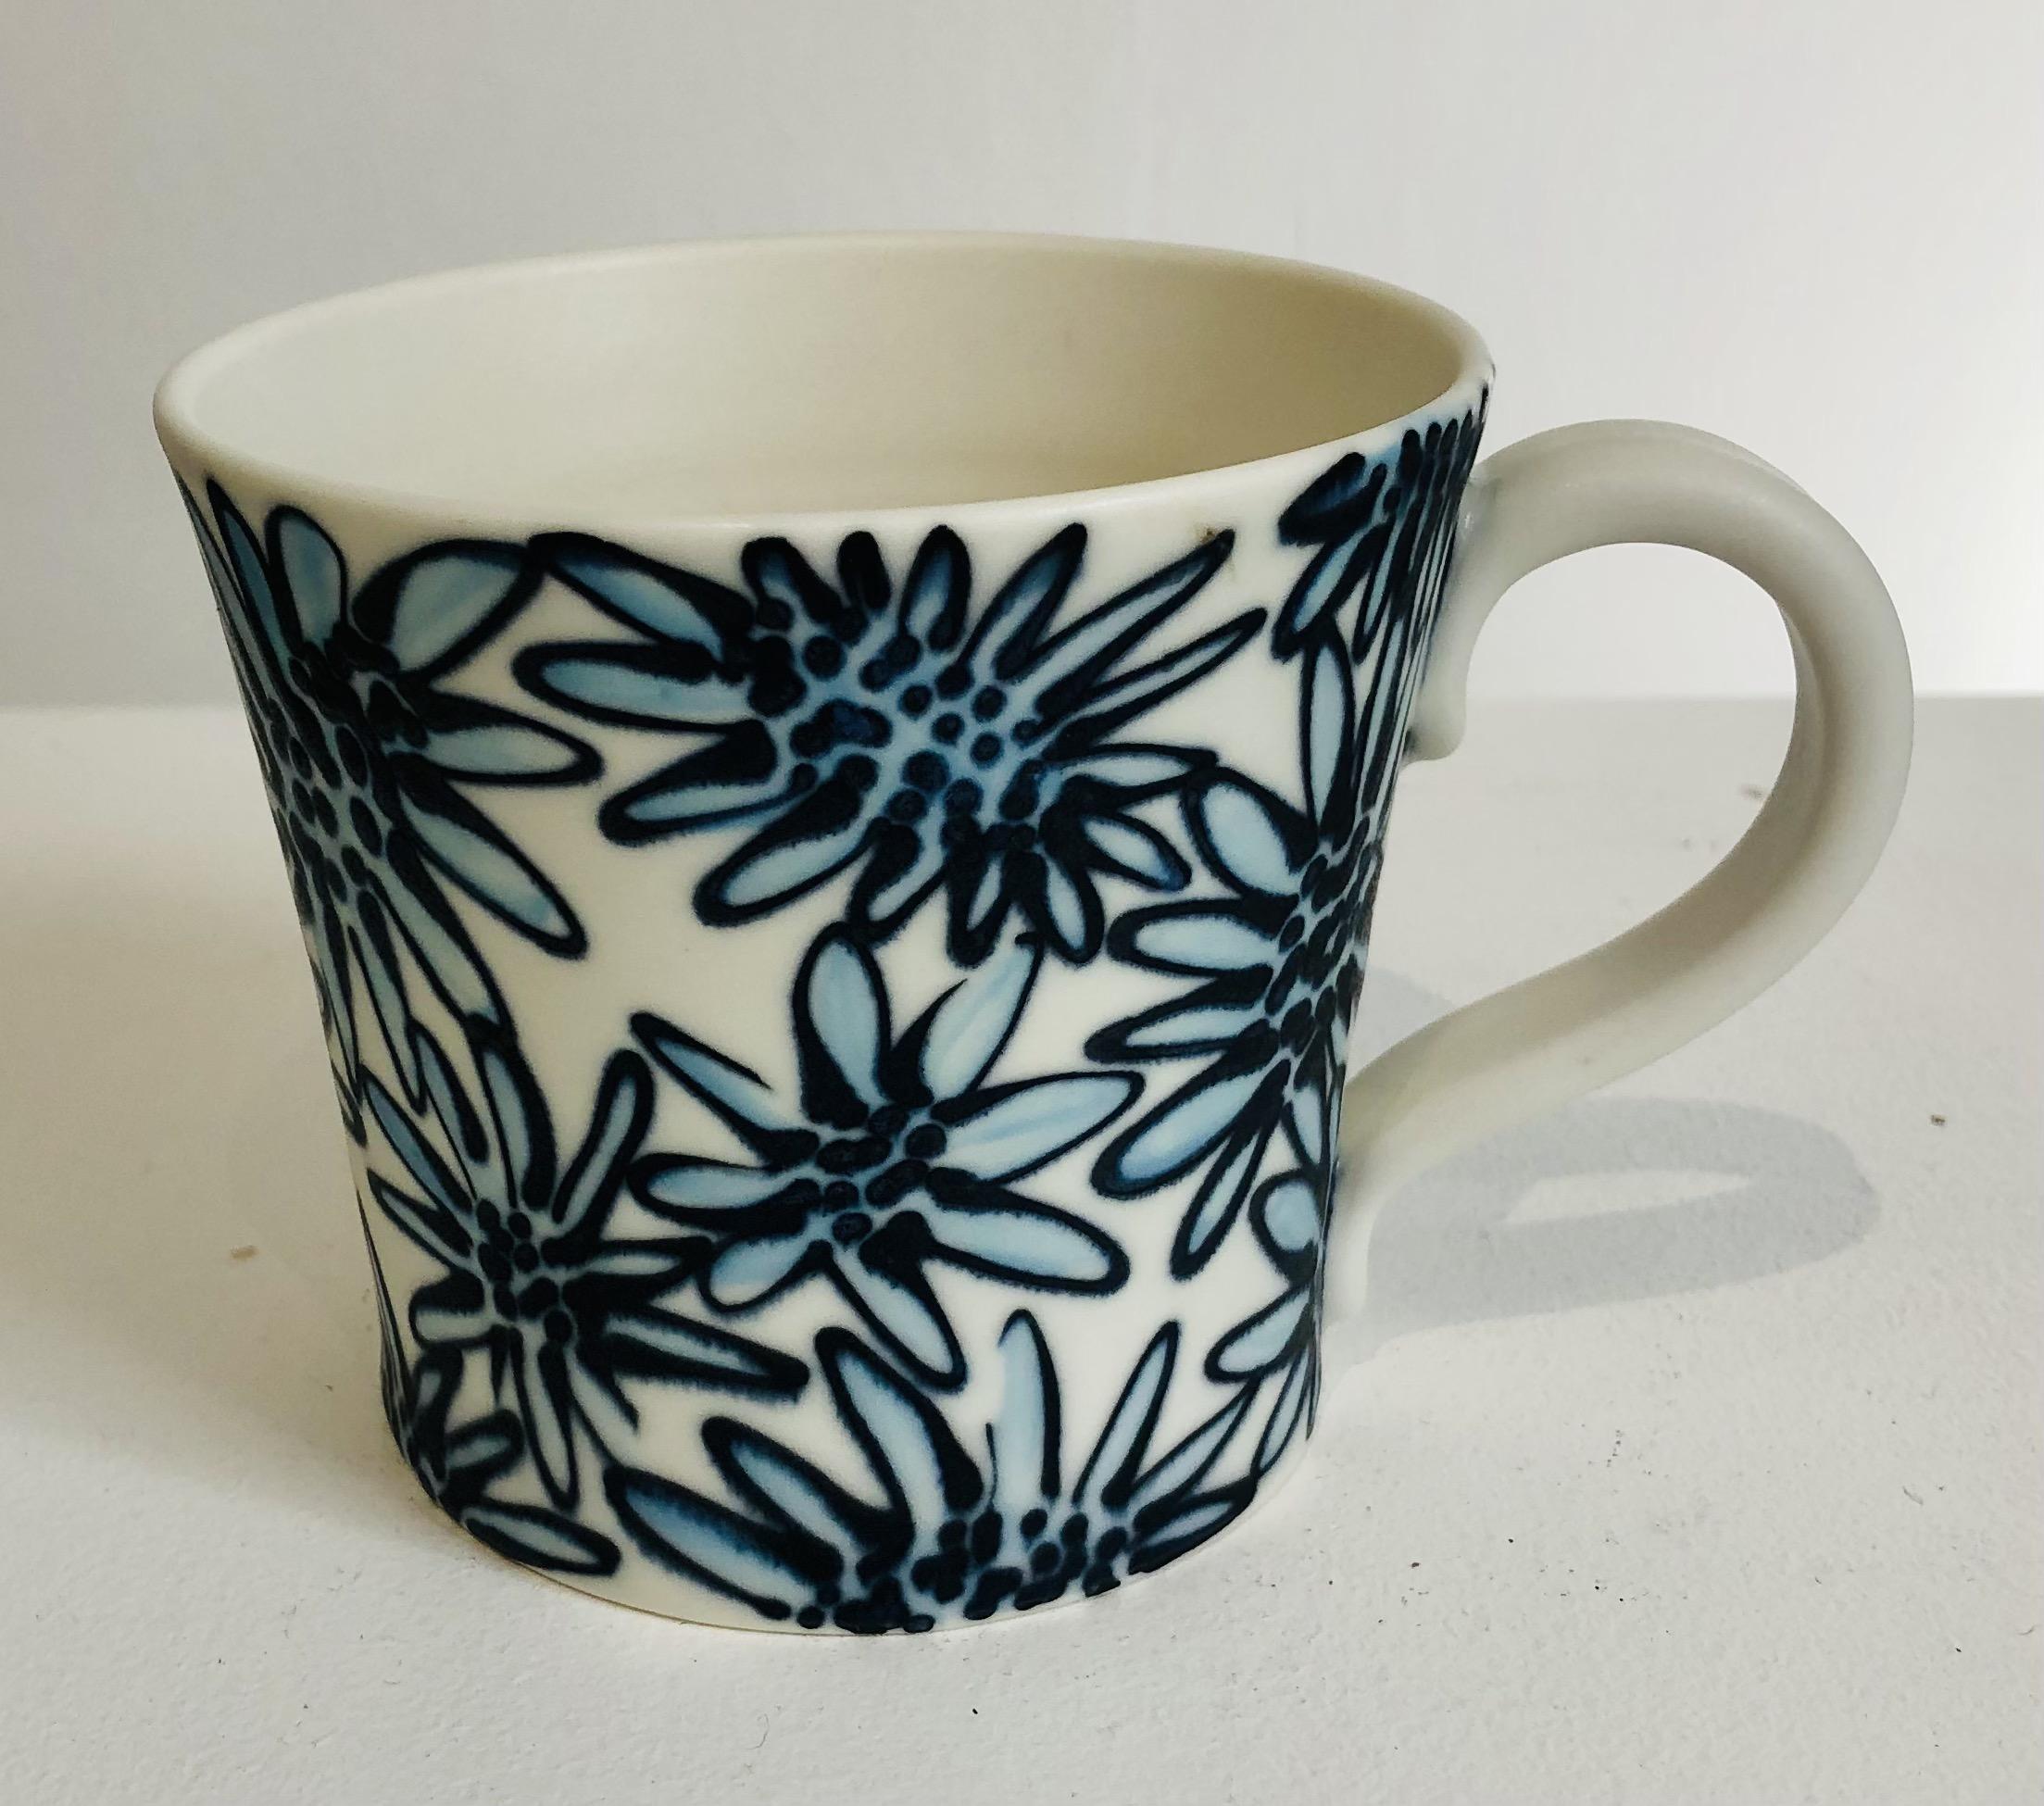 Mug handmade by ceramicist Philippa de Burlet